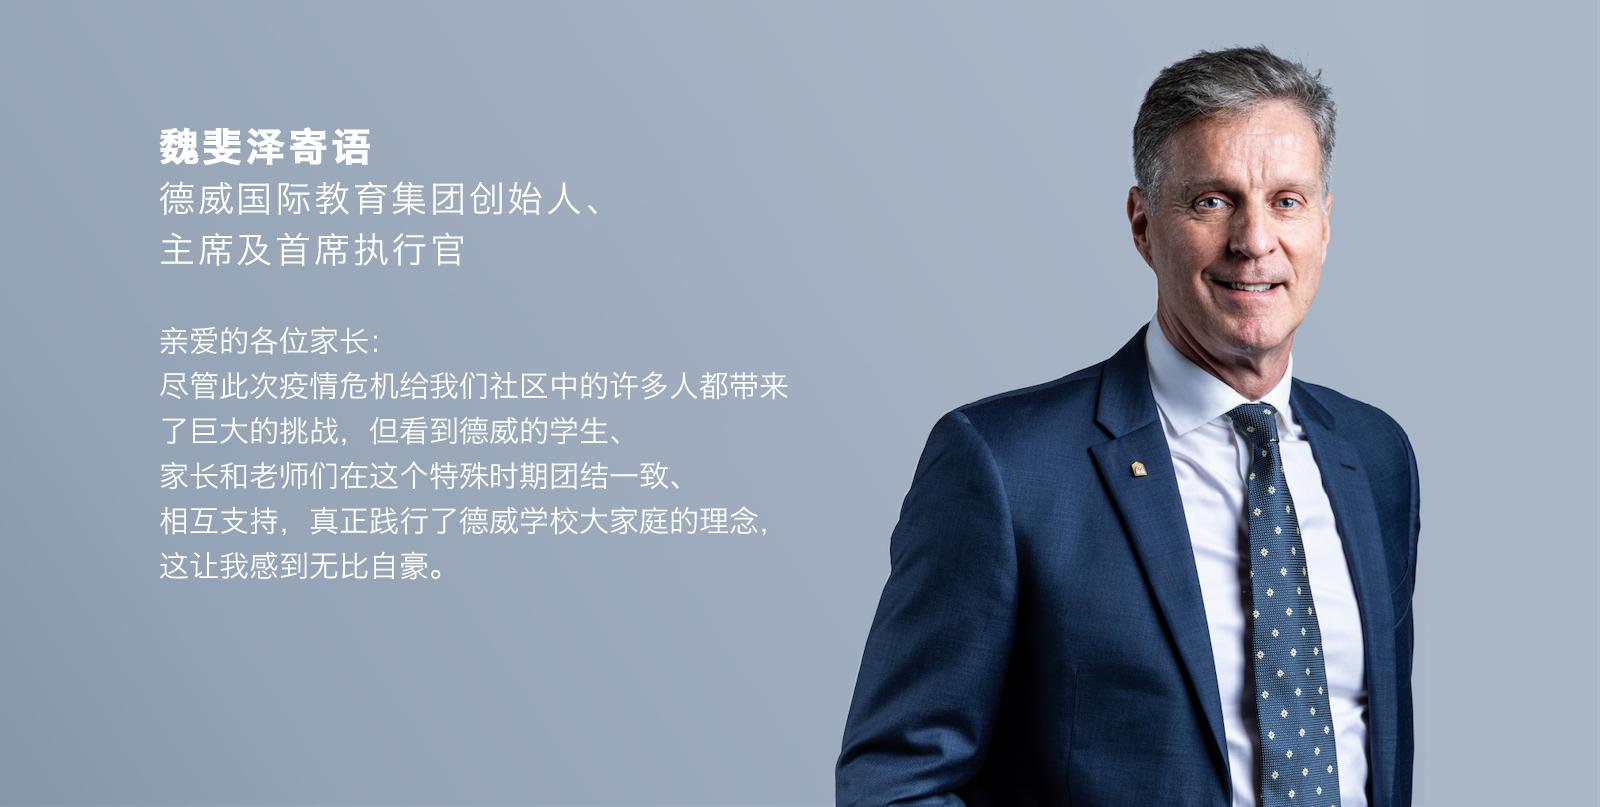 fraser-white-cn-苏州德威国际高中